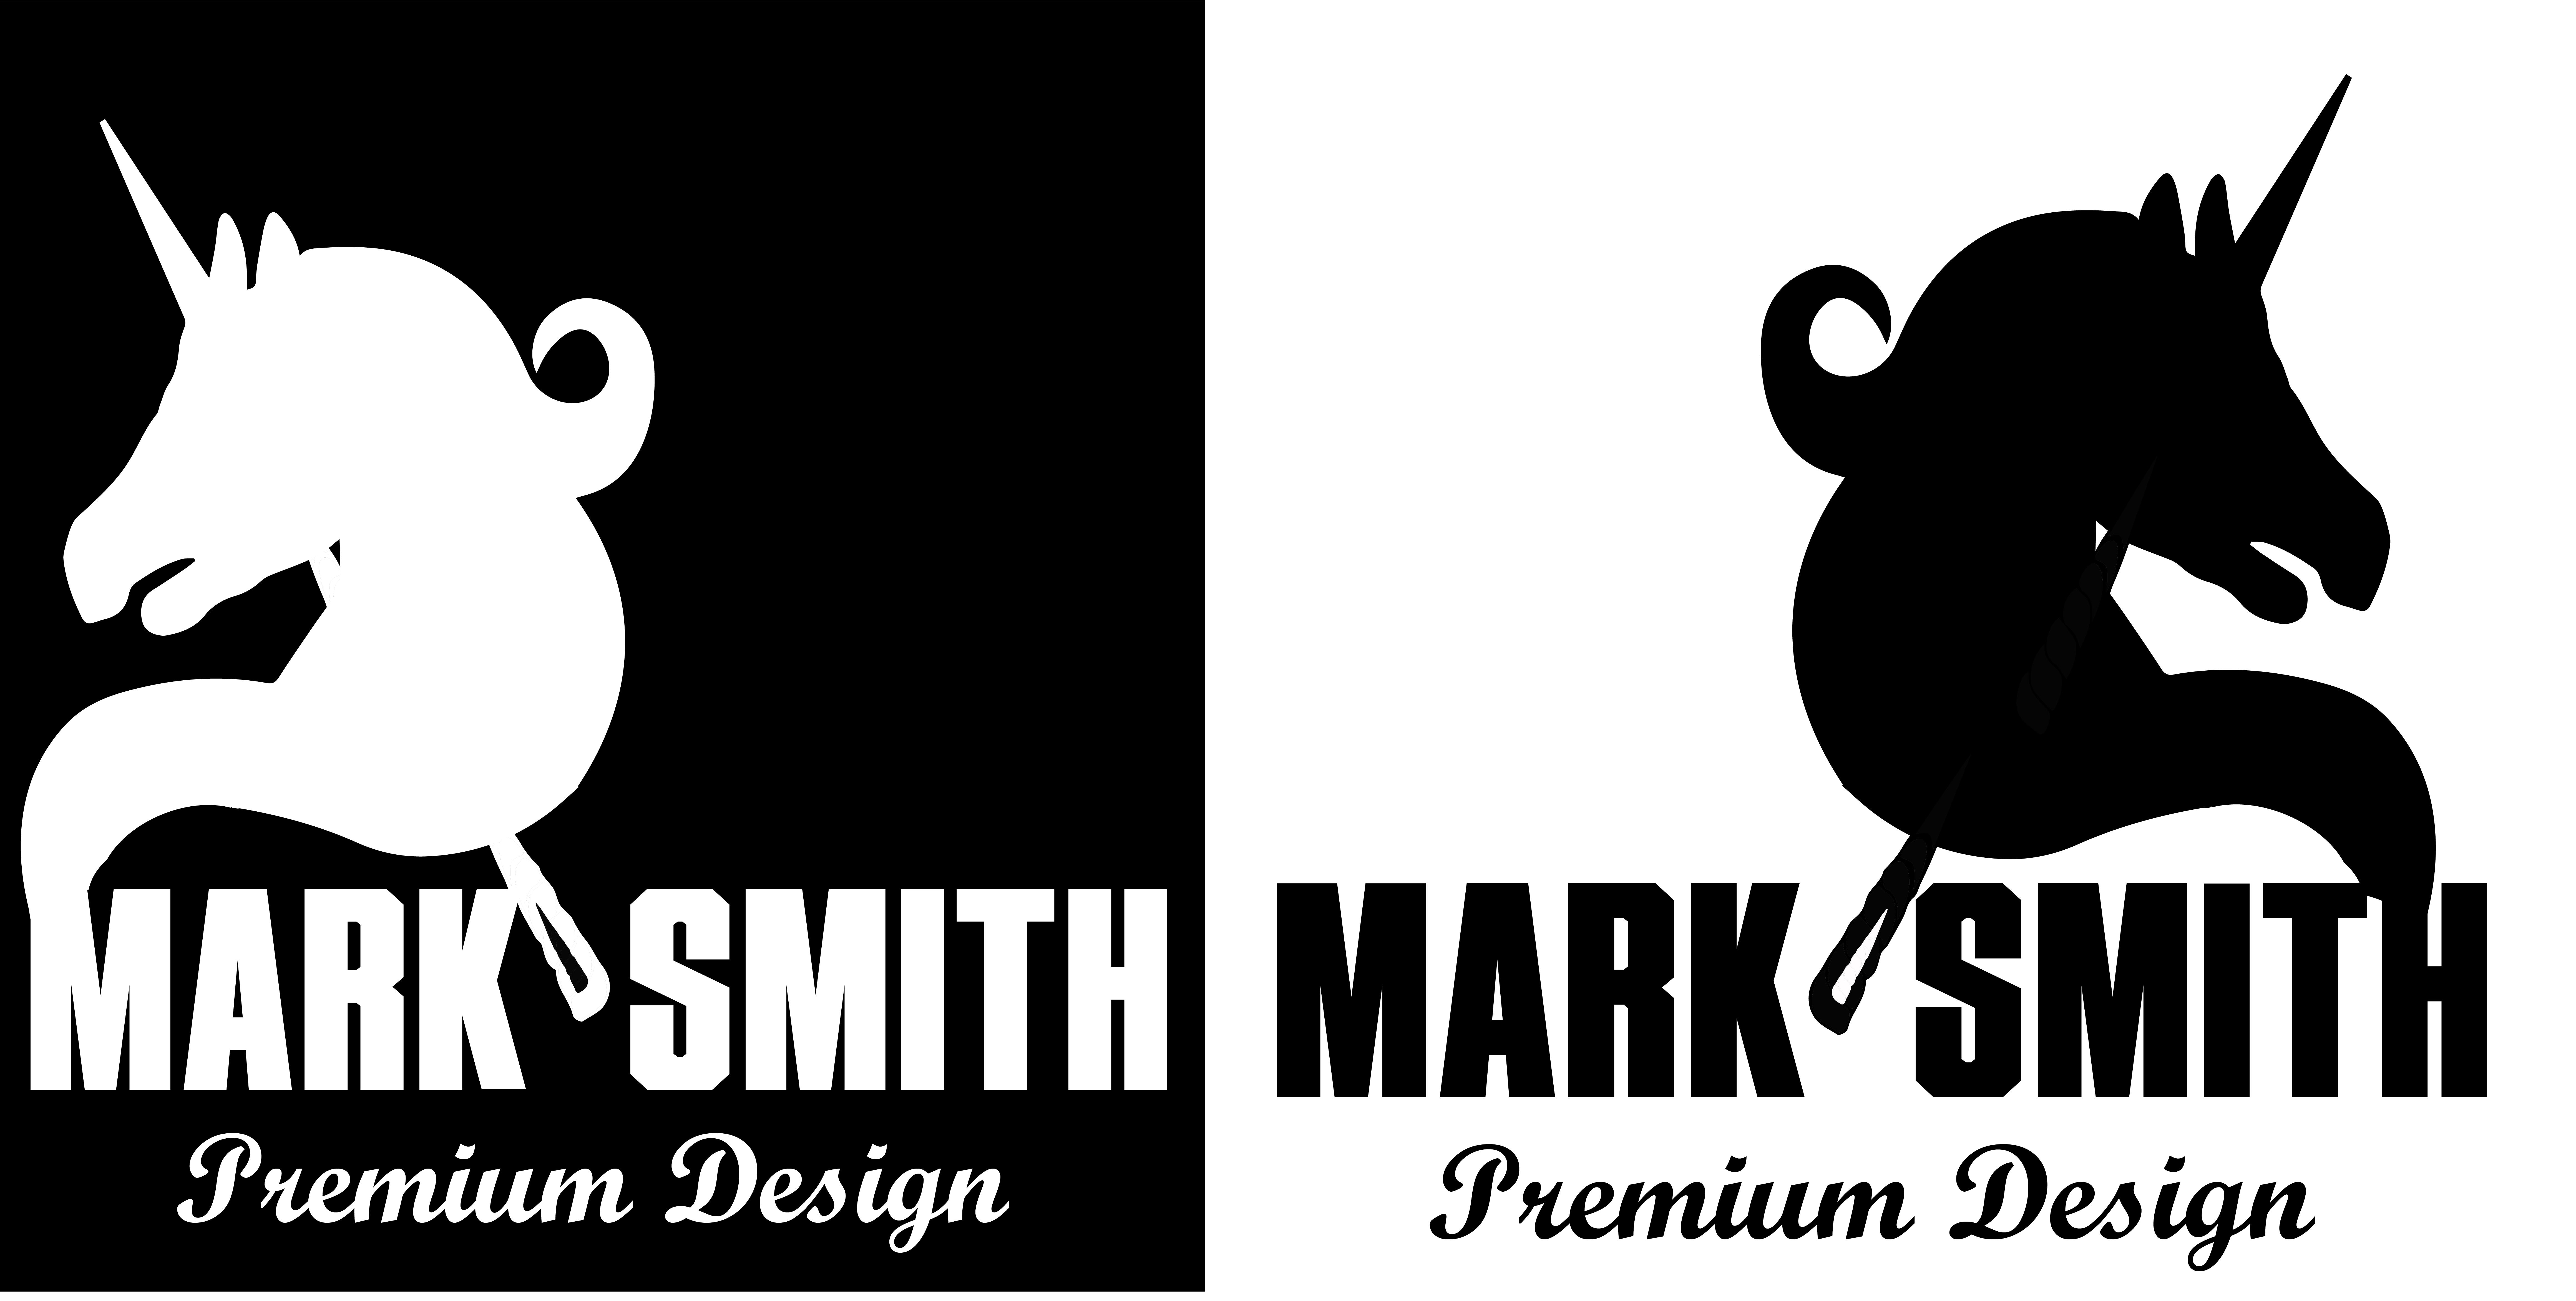 Разработка логотипа для ЛИЧНОГО БРЕНДА.  фото f_6085d001c065fc50.jpg